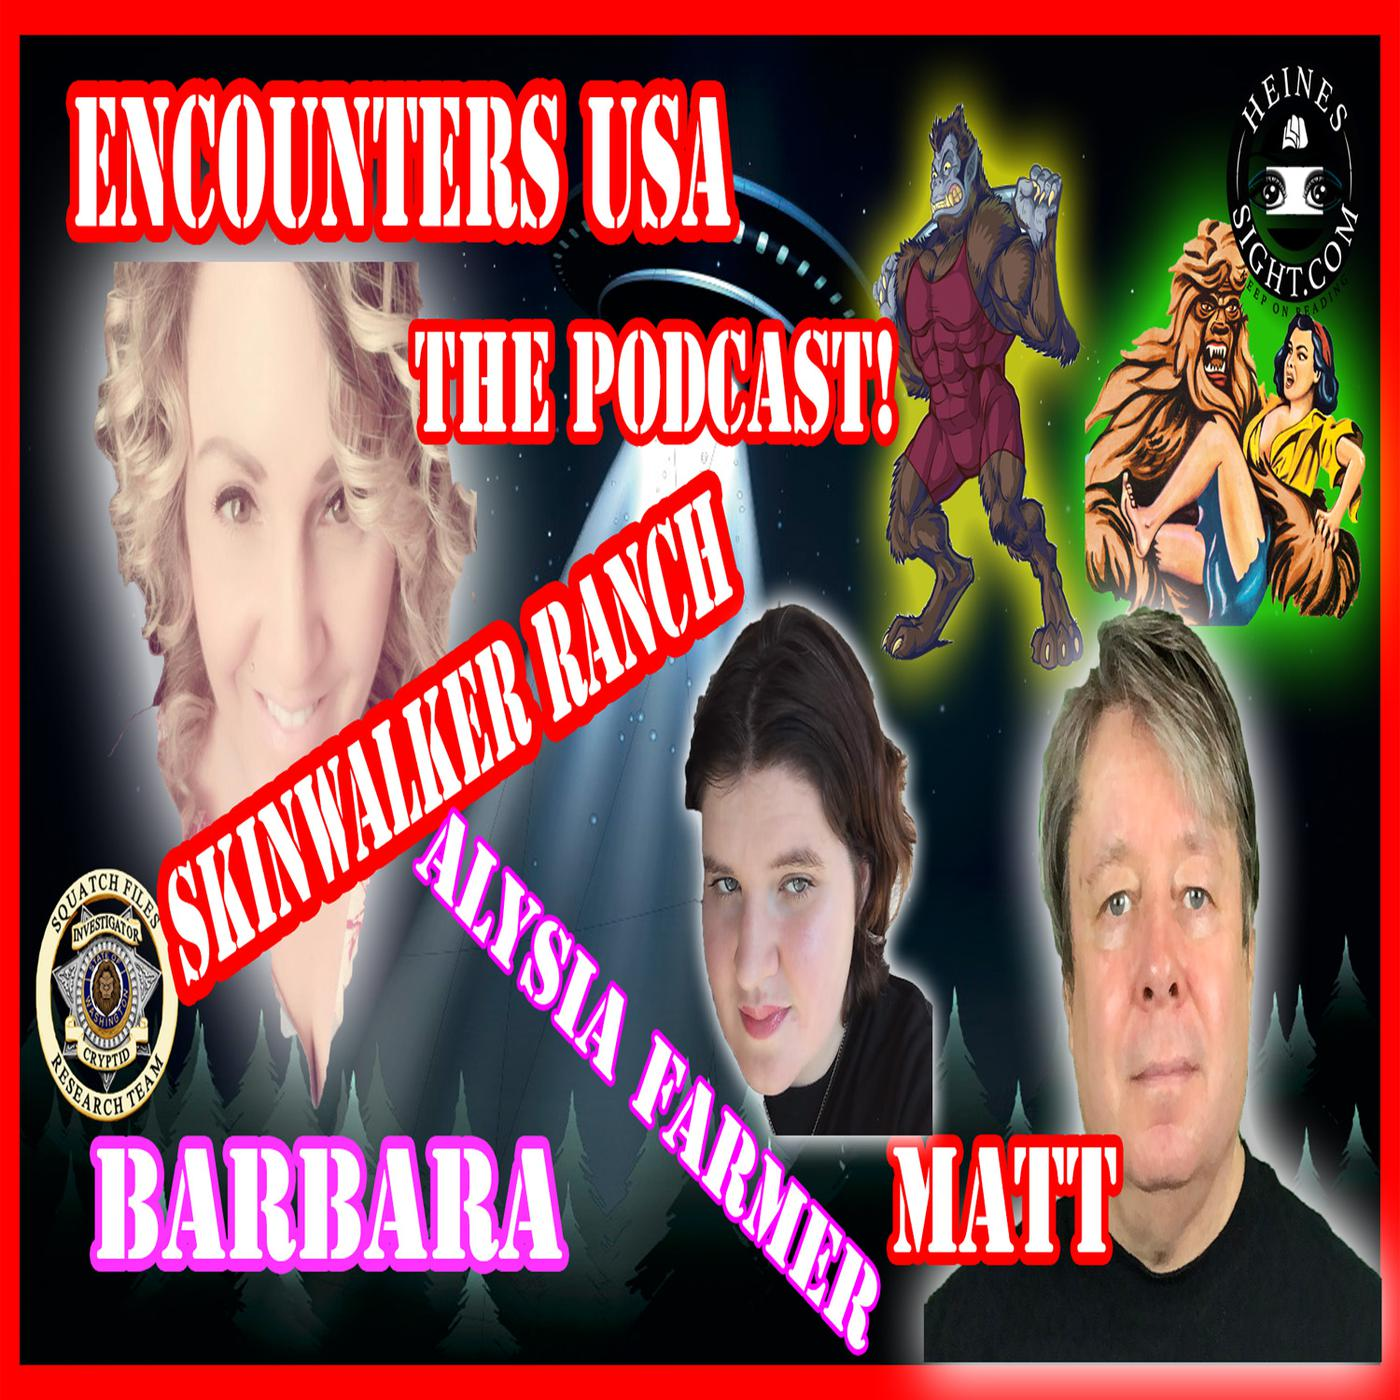 Skinwalker Ranch Portals, Aliens and Dogman - Encounters USA